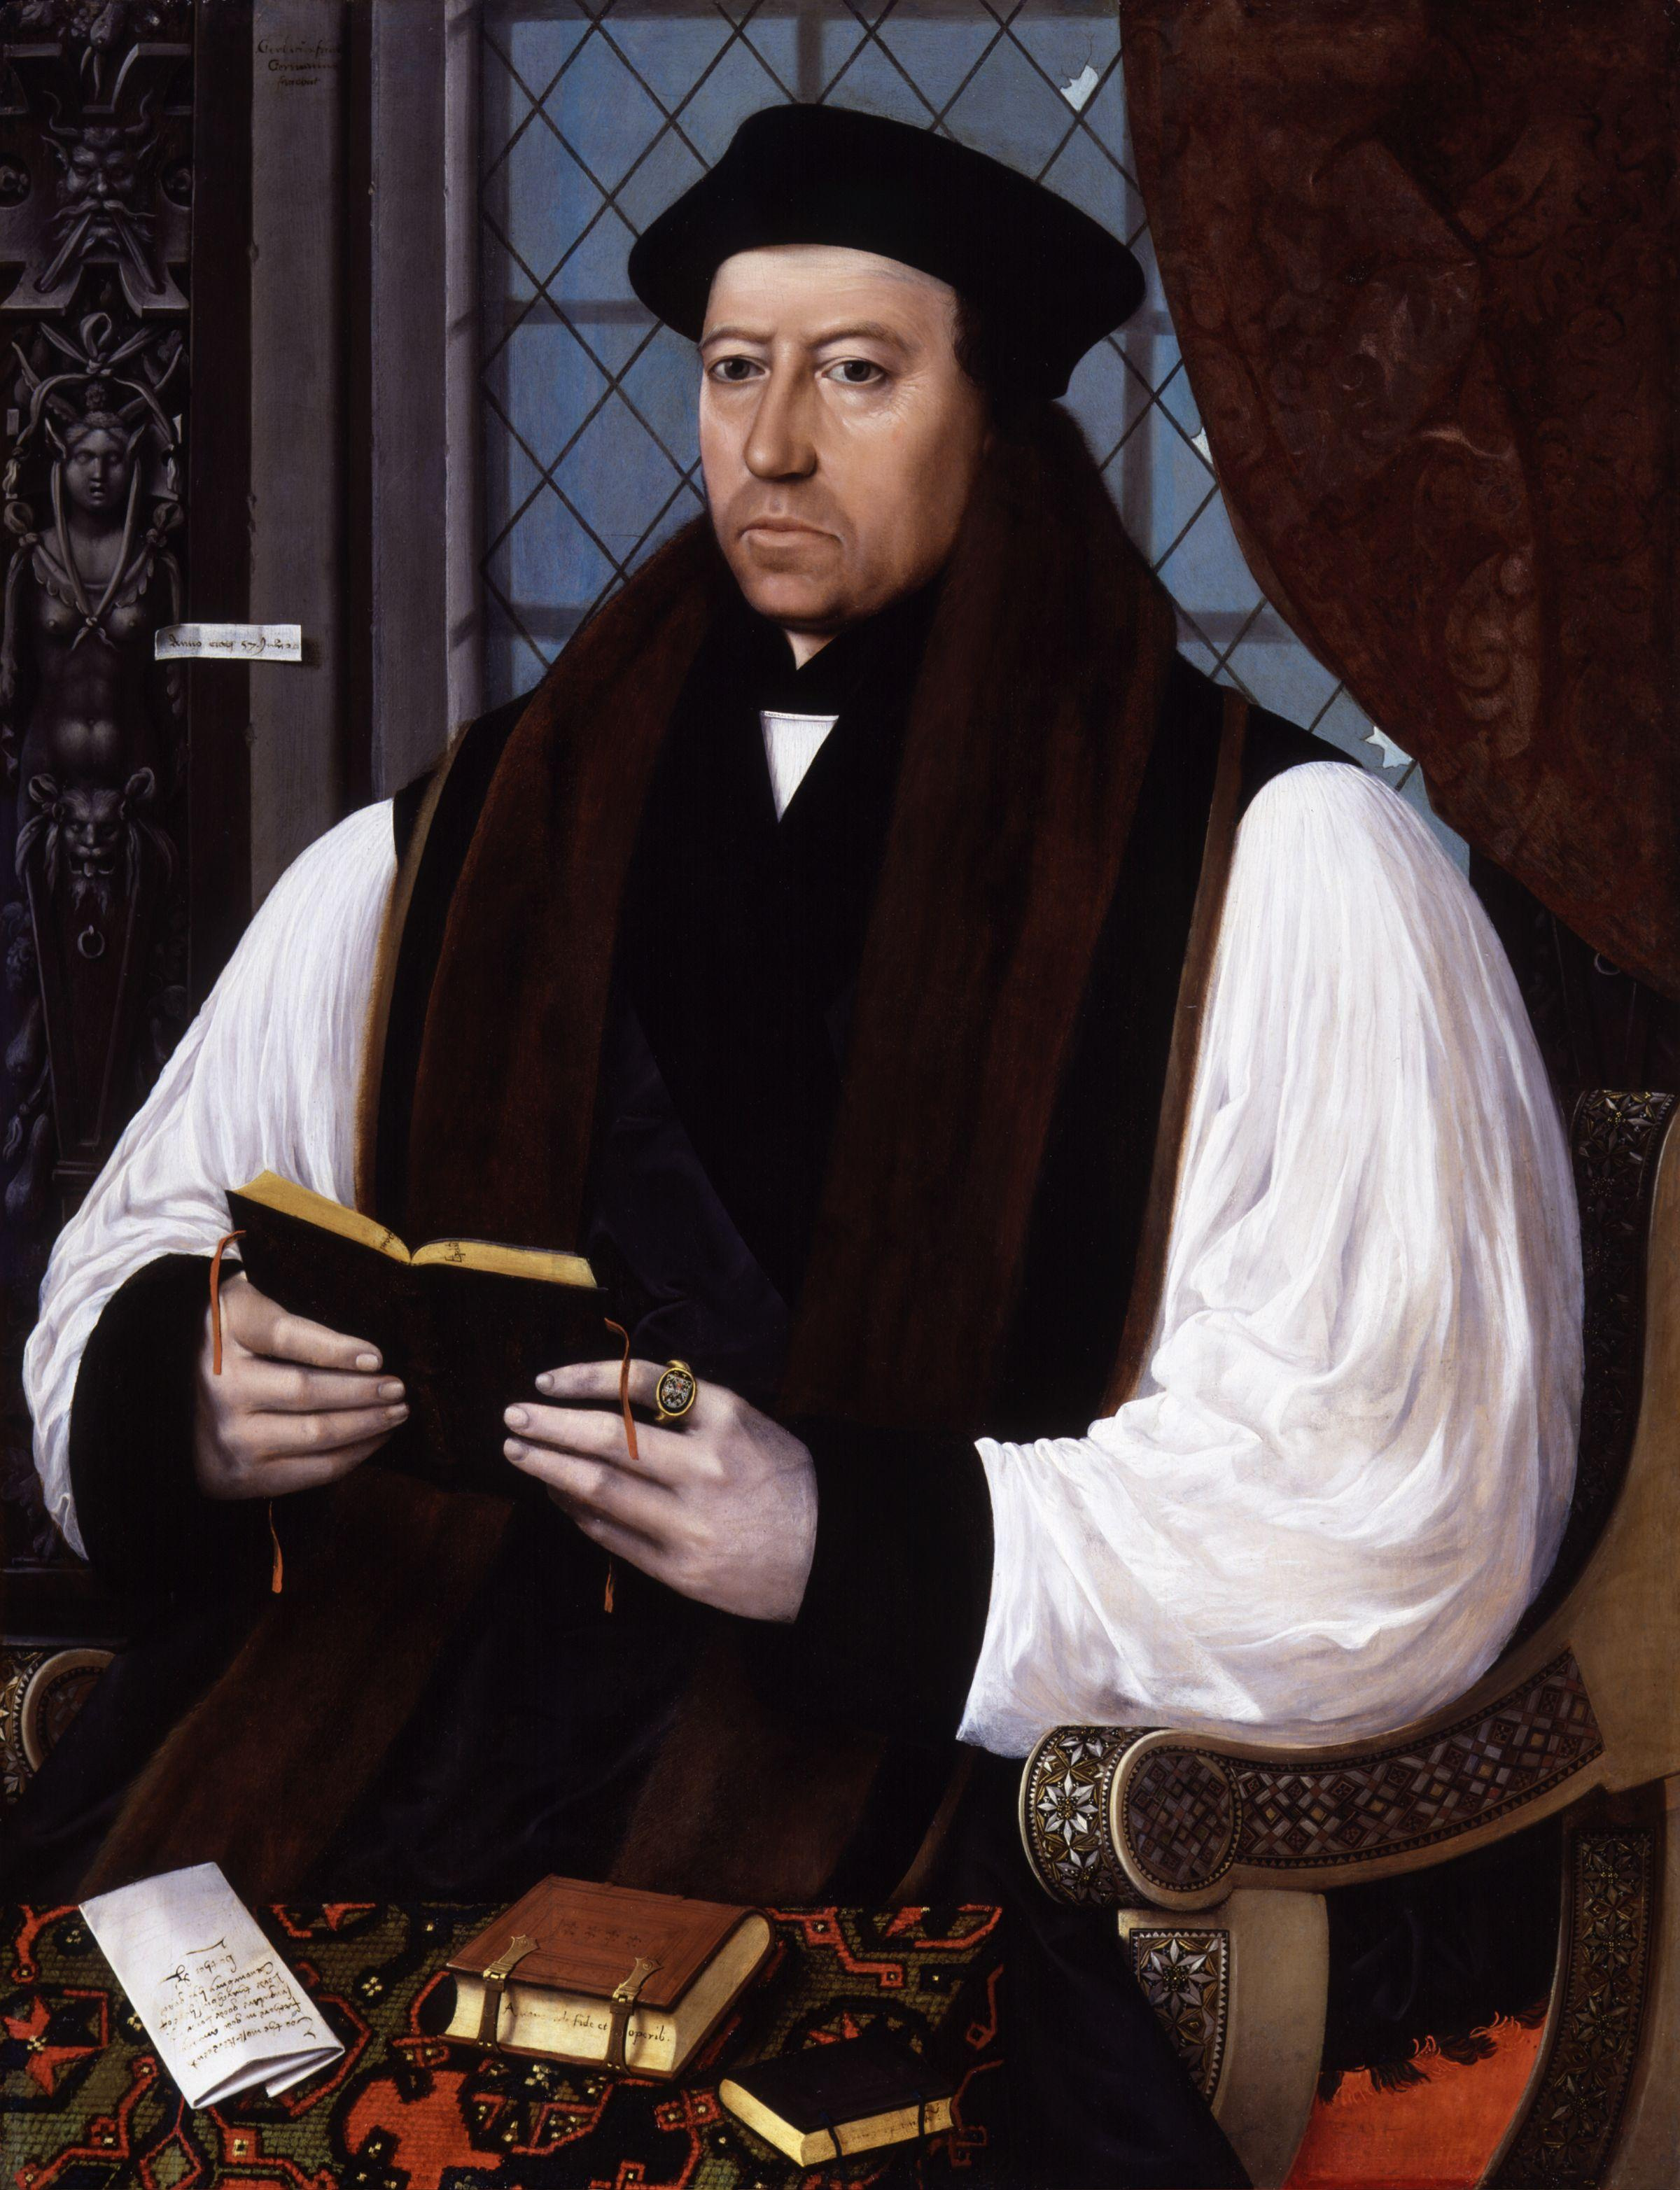 Thomas Cranmer, Archbishop of Canterbury and Martyr